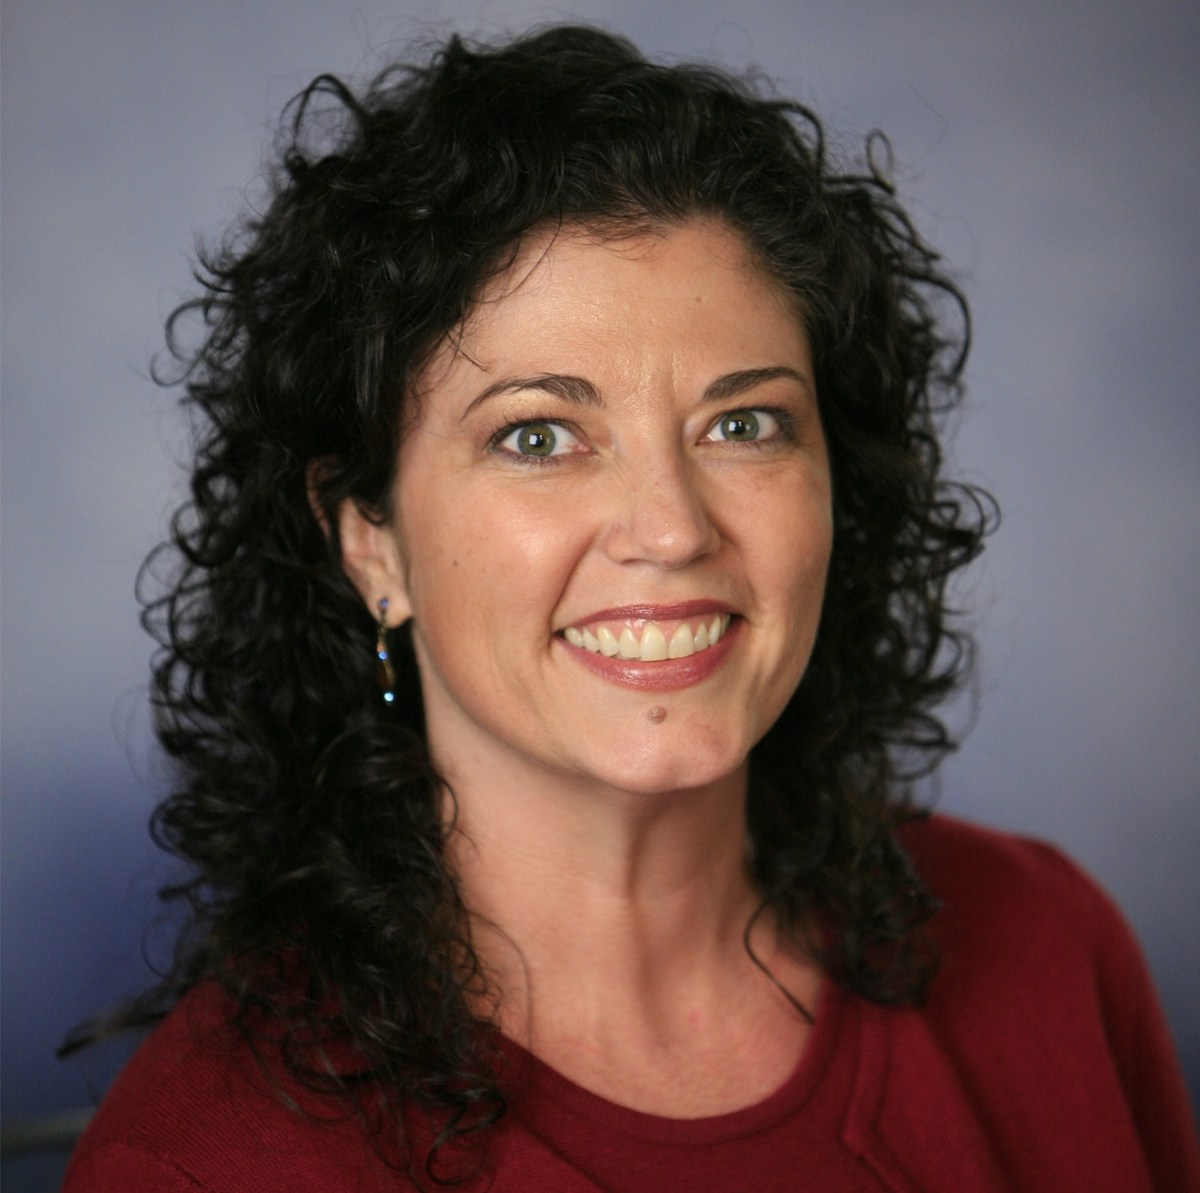 Board Member Jennifer Singer